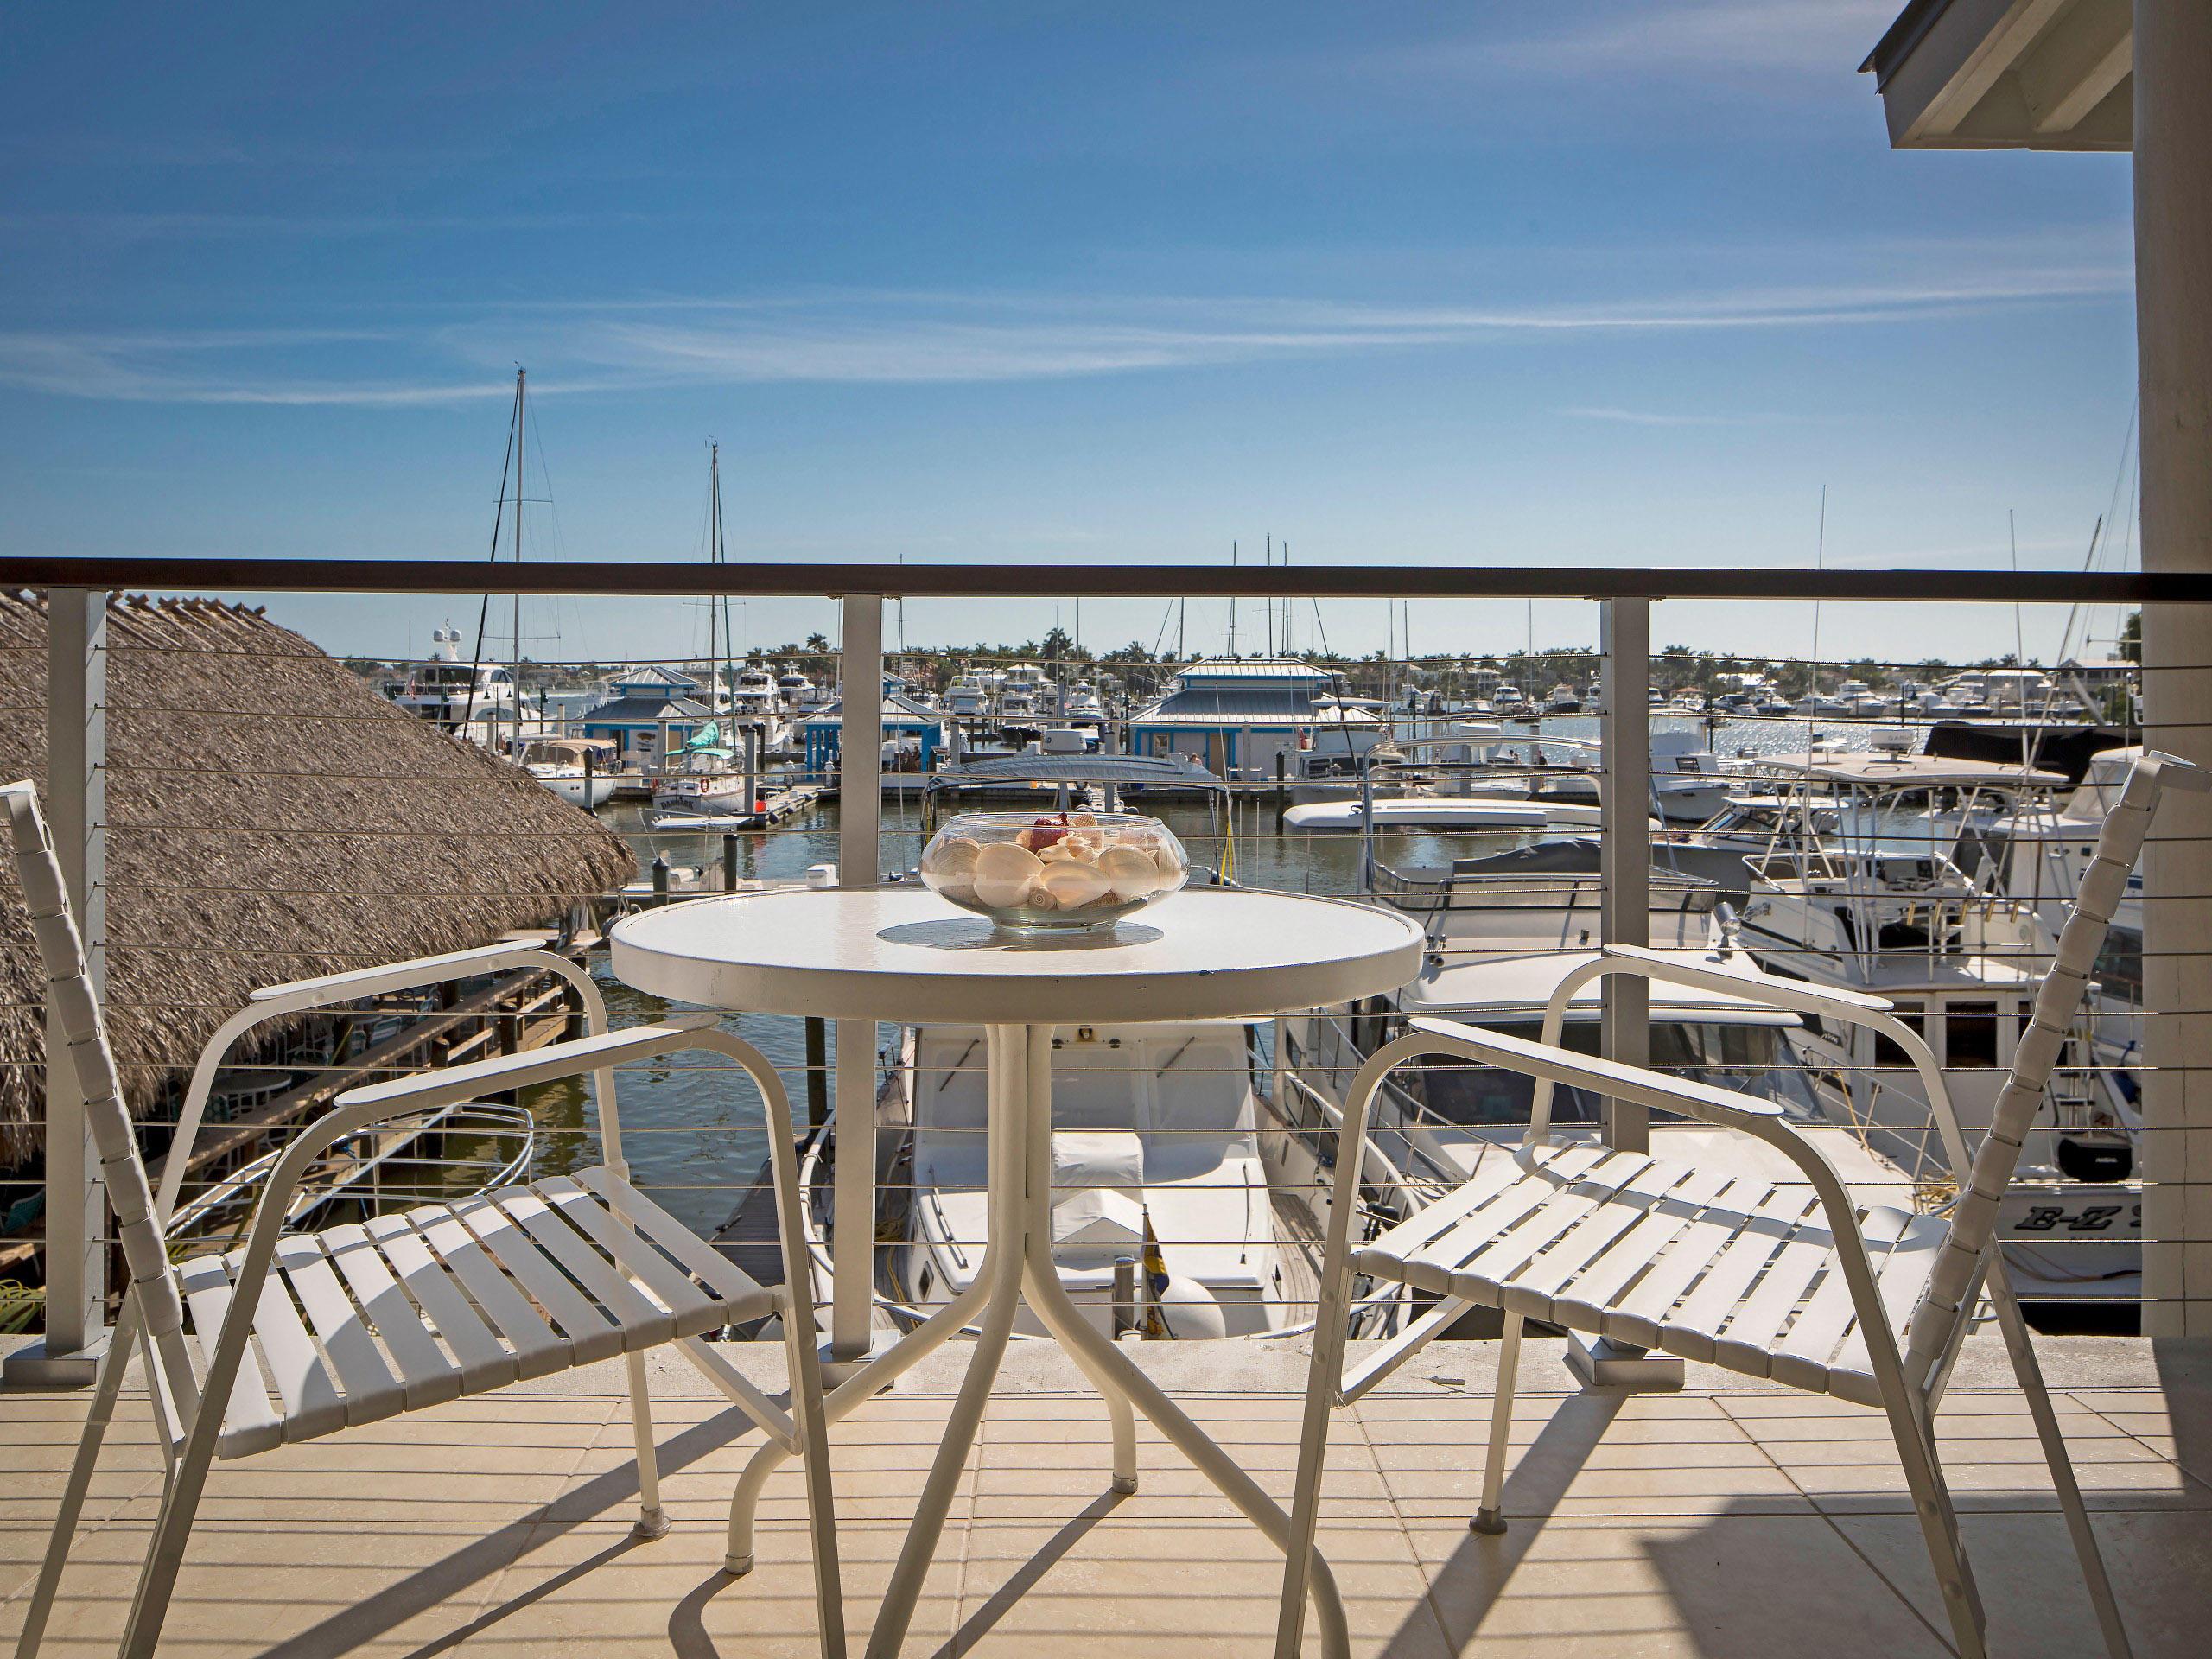 Patio set on balcony with harbor views.